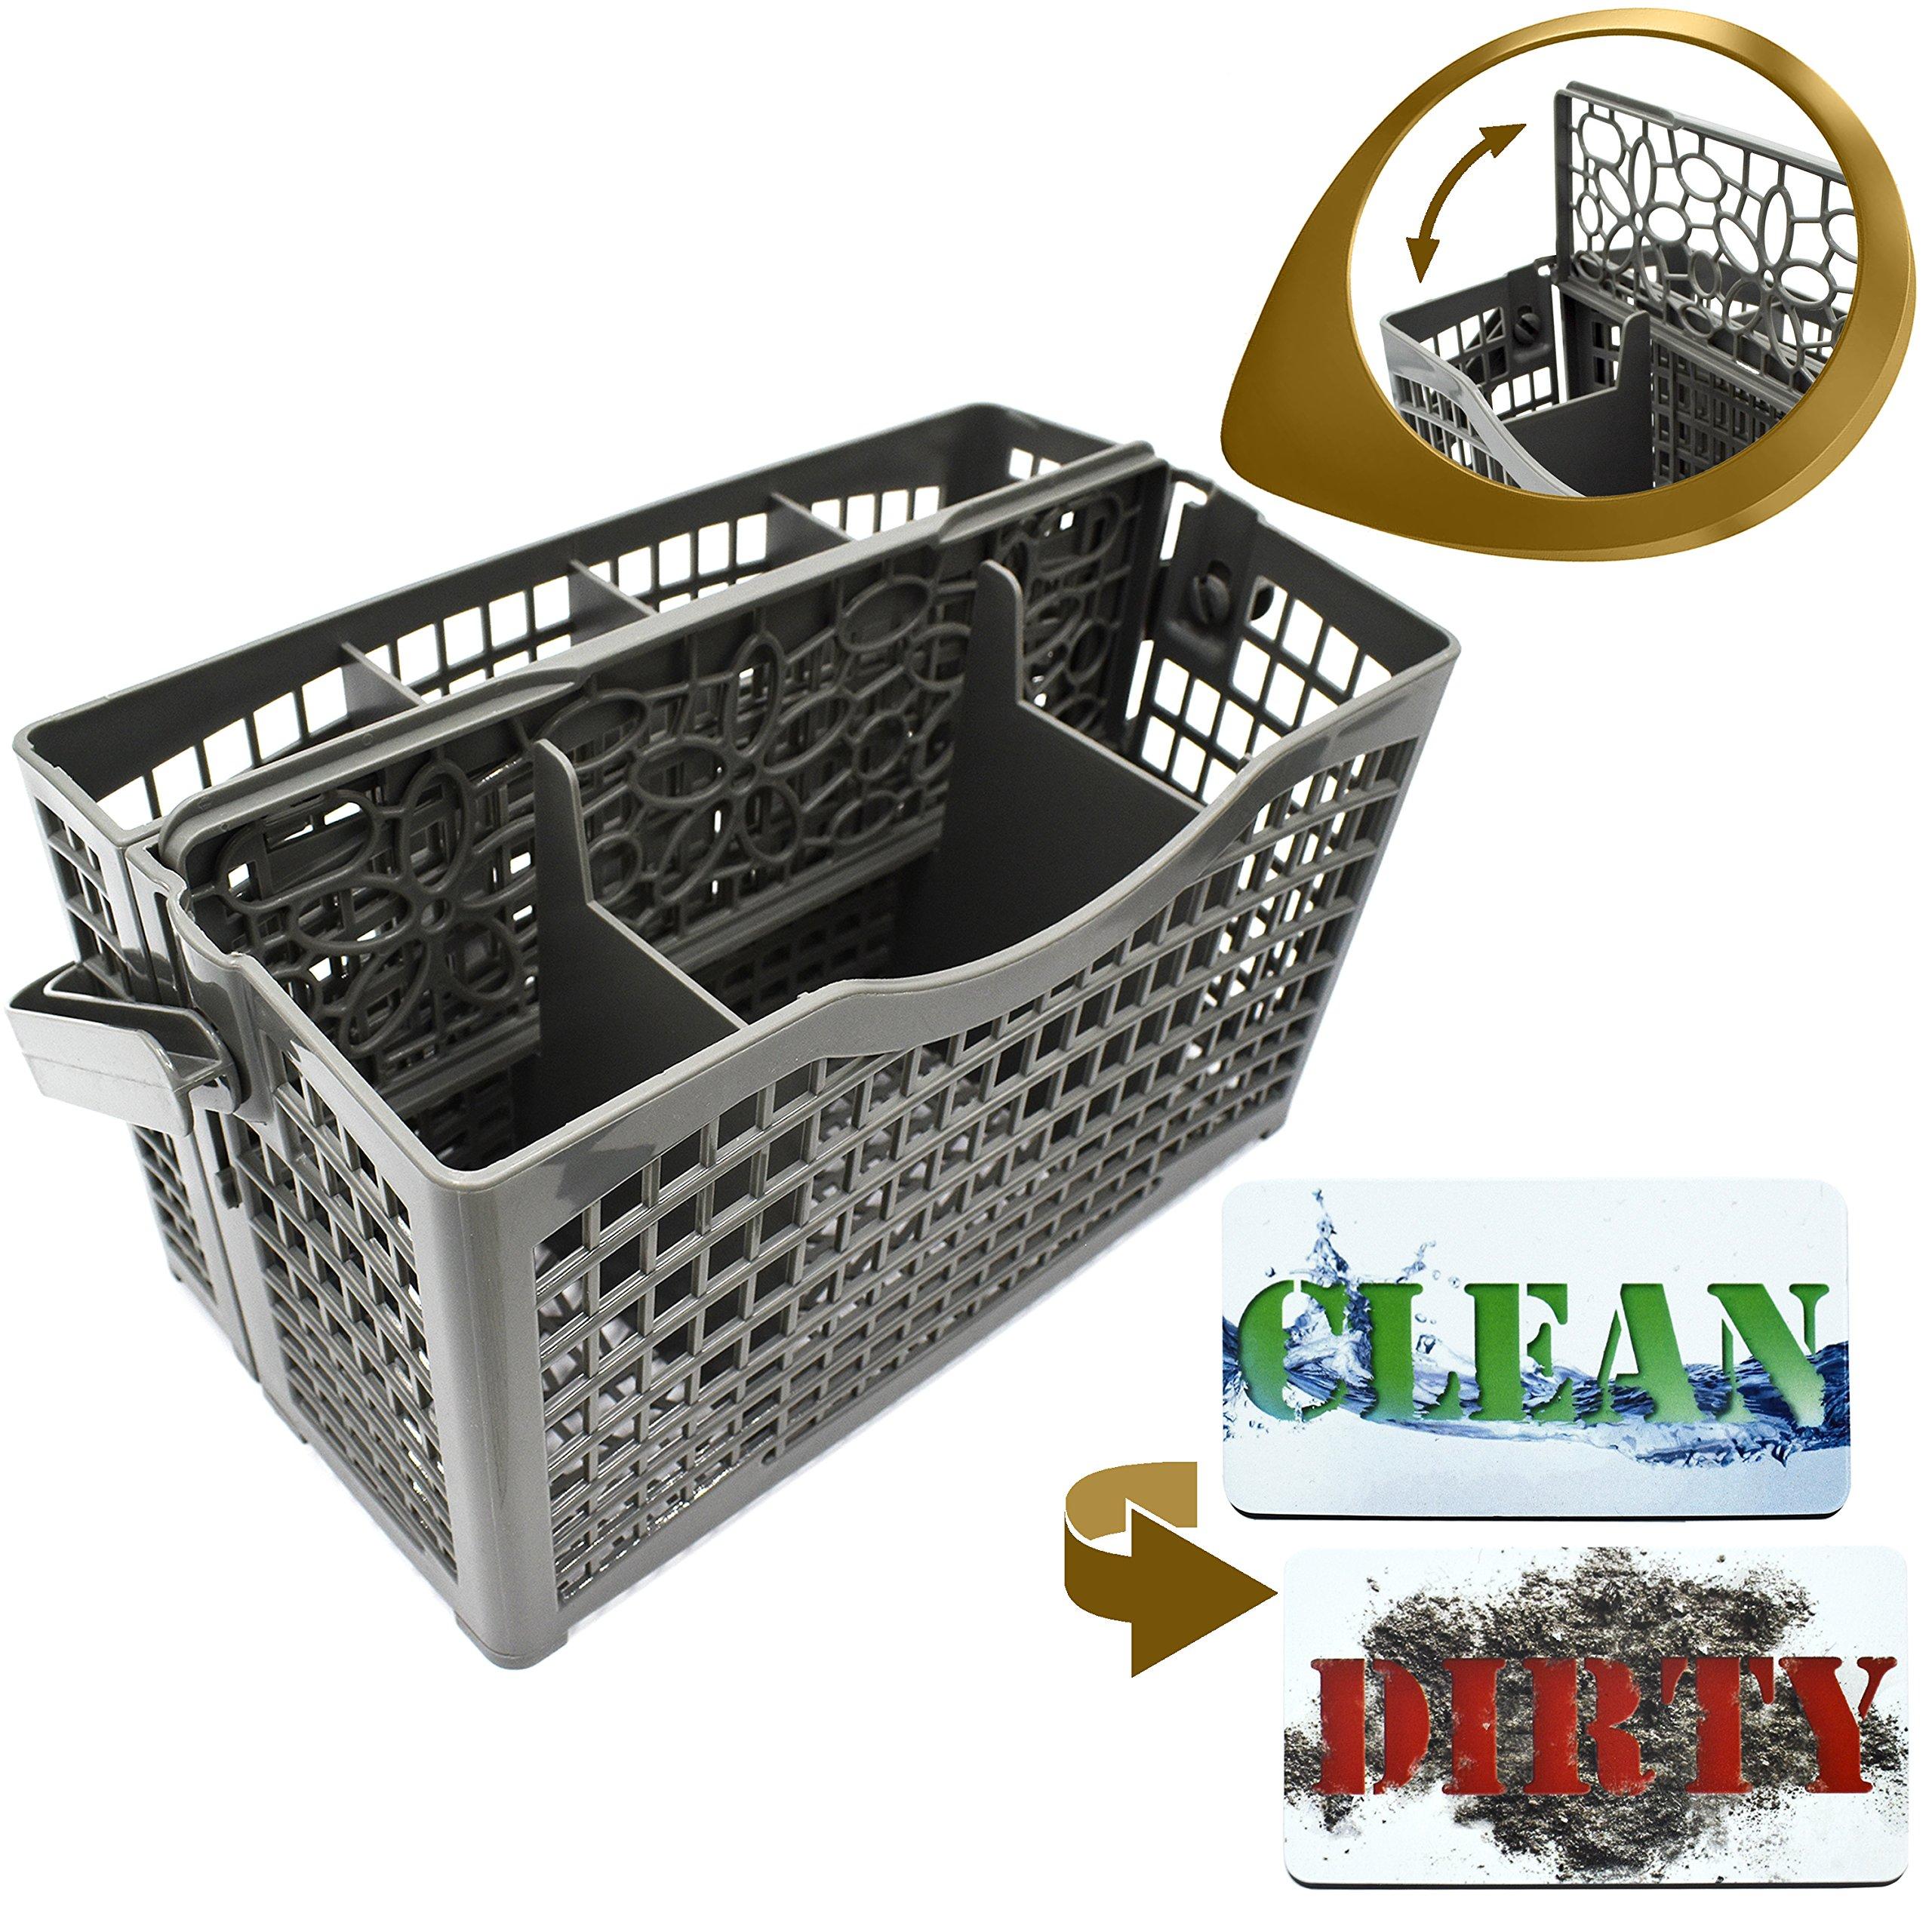 Dishwasher Silverware Replacement Basket Universal - Clean Dirty Magnet Sign - Utensil/Cutlery Holder - Fits Bosch, Maytag, Kenmore, Whirlpool, KitchenAid, LG, Samsung, Frigidaire, GE